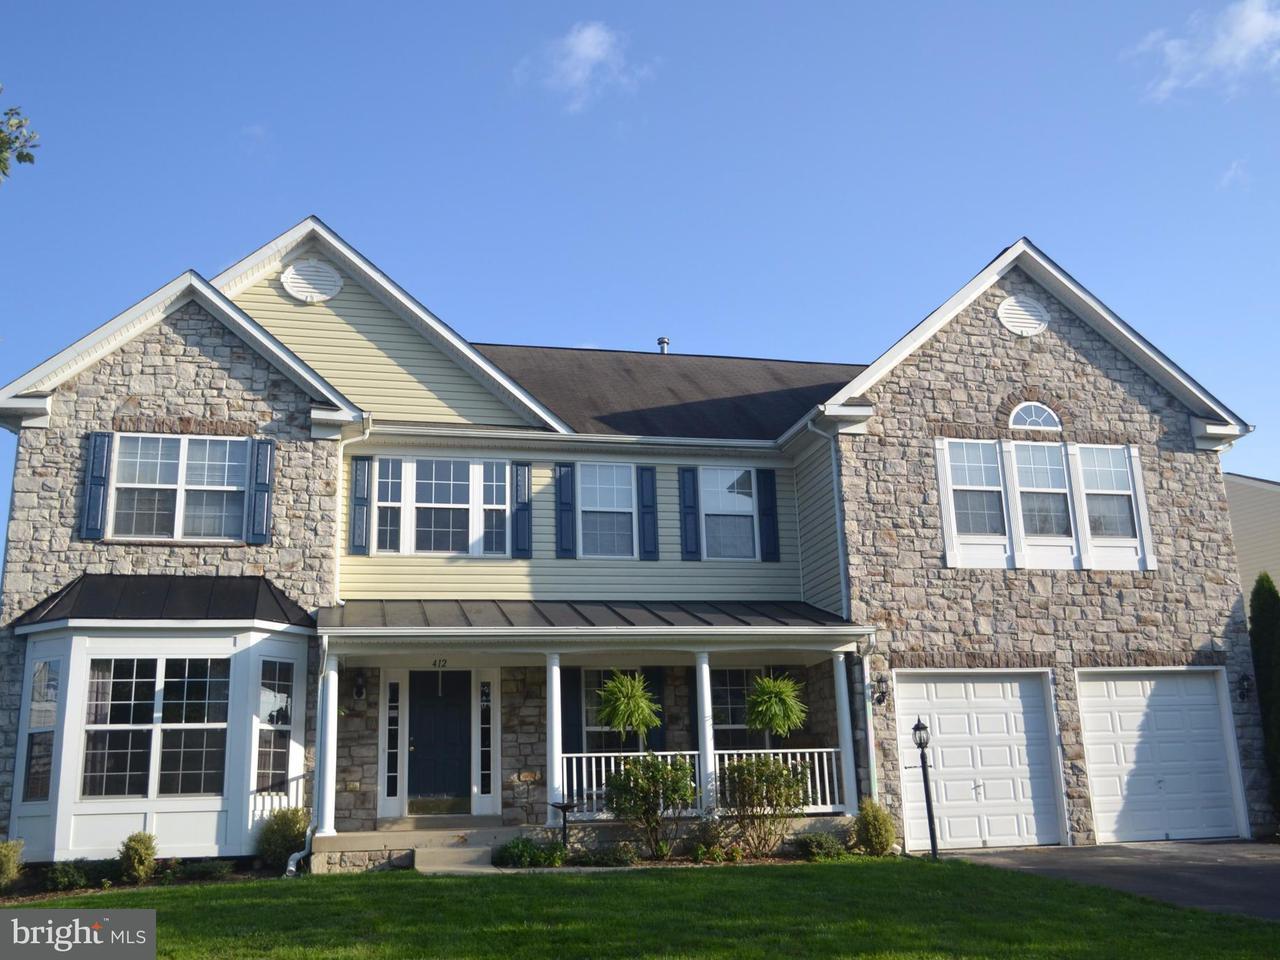 獨棟家庭住宅 為 出售 在 412 Autumn Chase Court 412 Autumn Chase Court Purcellville, 弗吉尼亞州 20132 美國